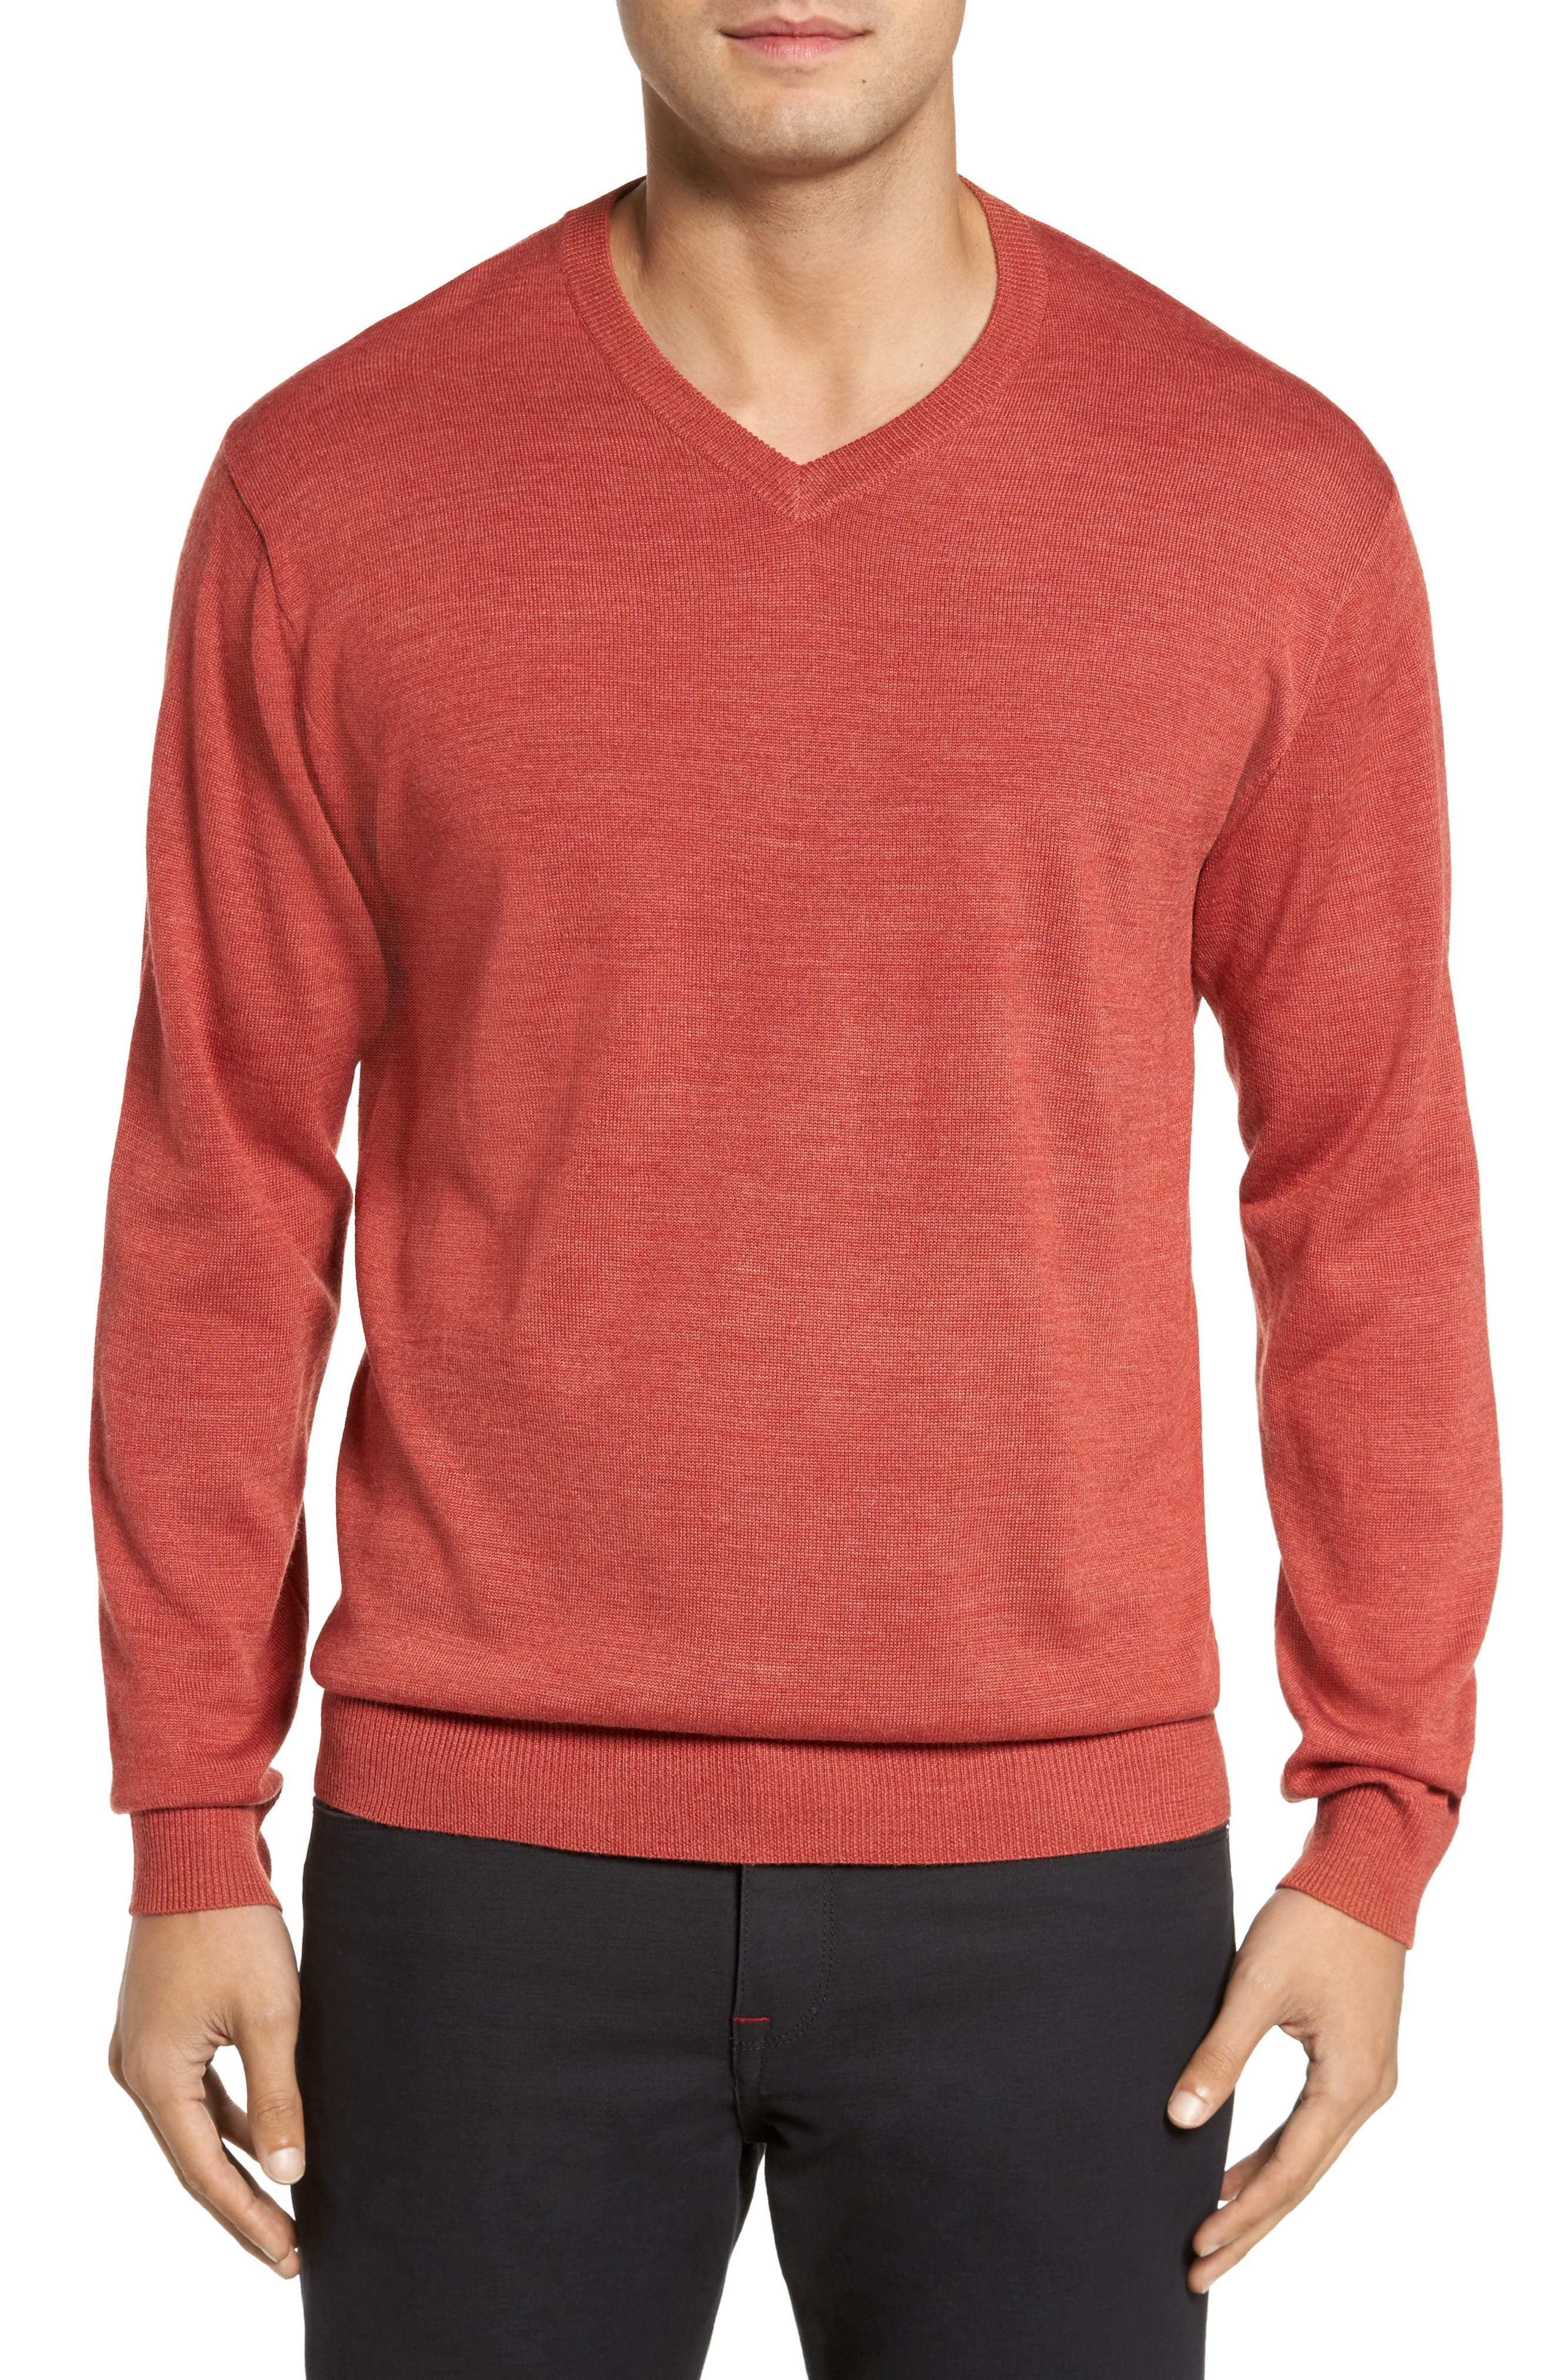 Main Image - Cutter & Buck 'Douglas' Merino Wool Blend V-Neck Sweater (Online Only)